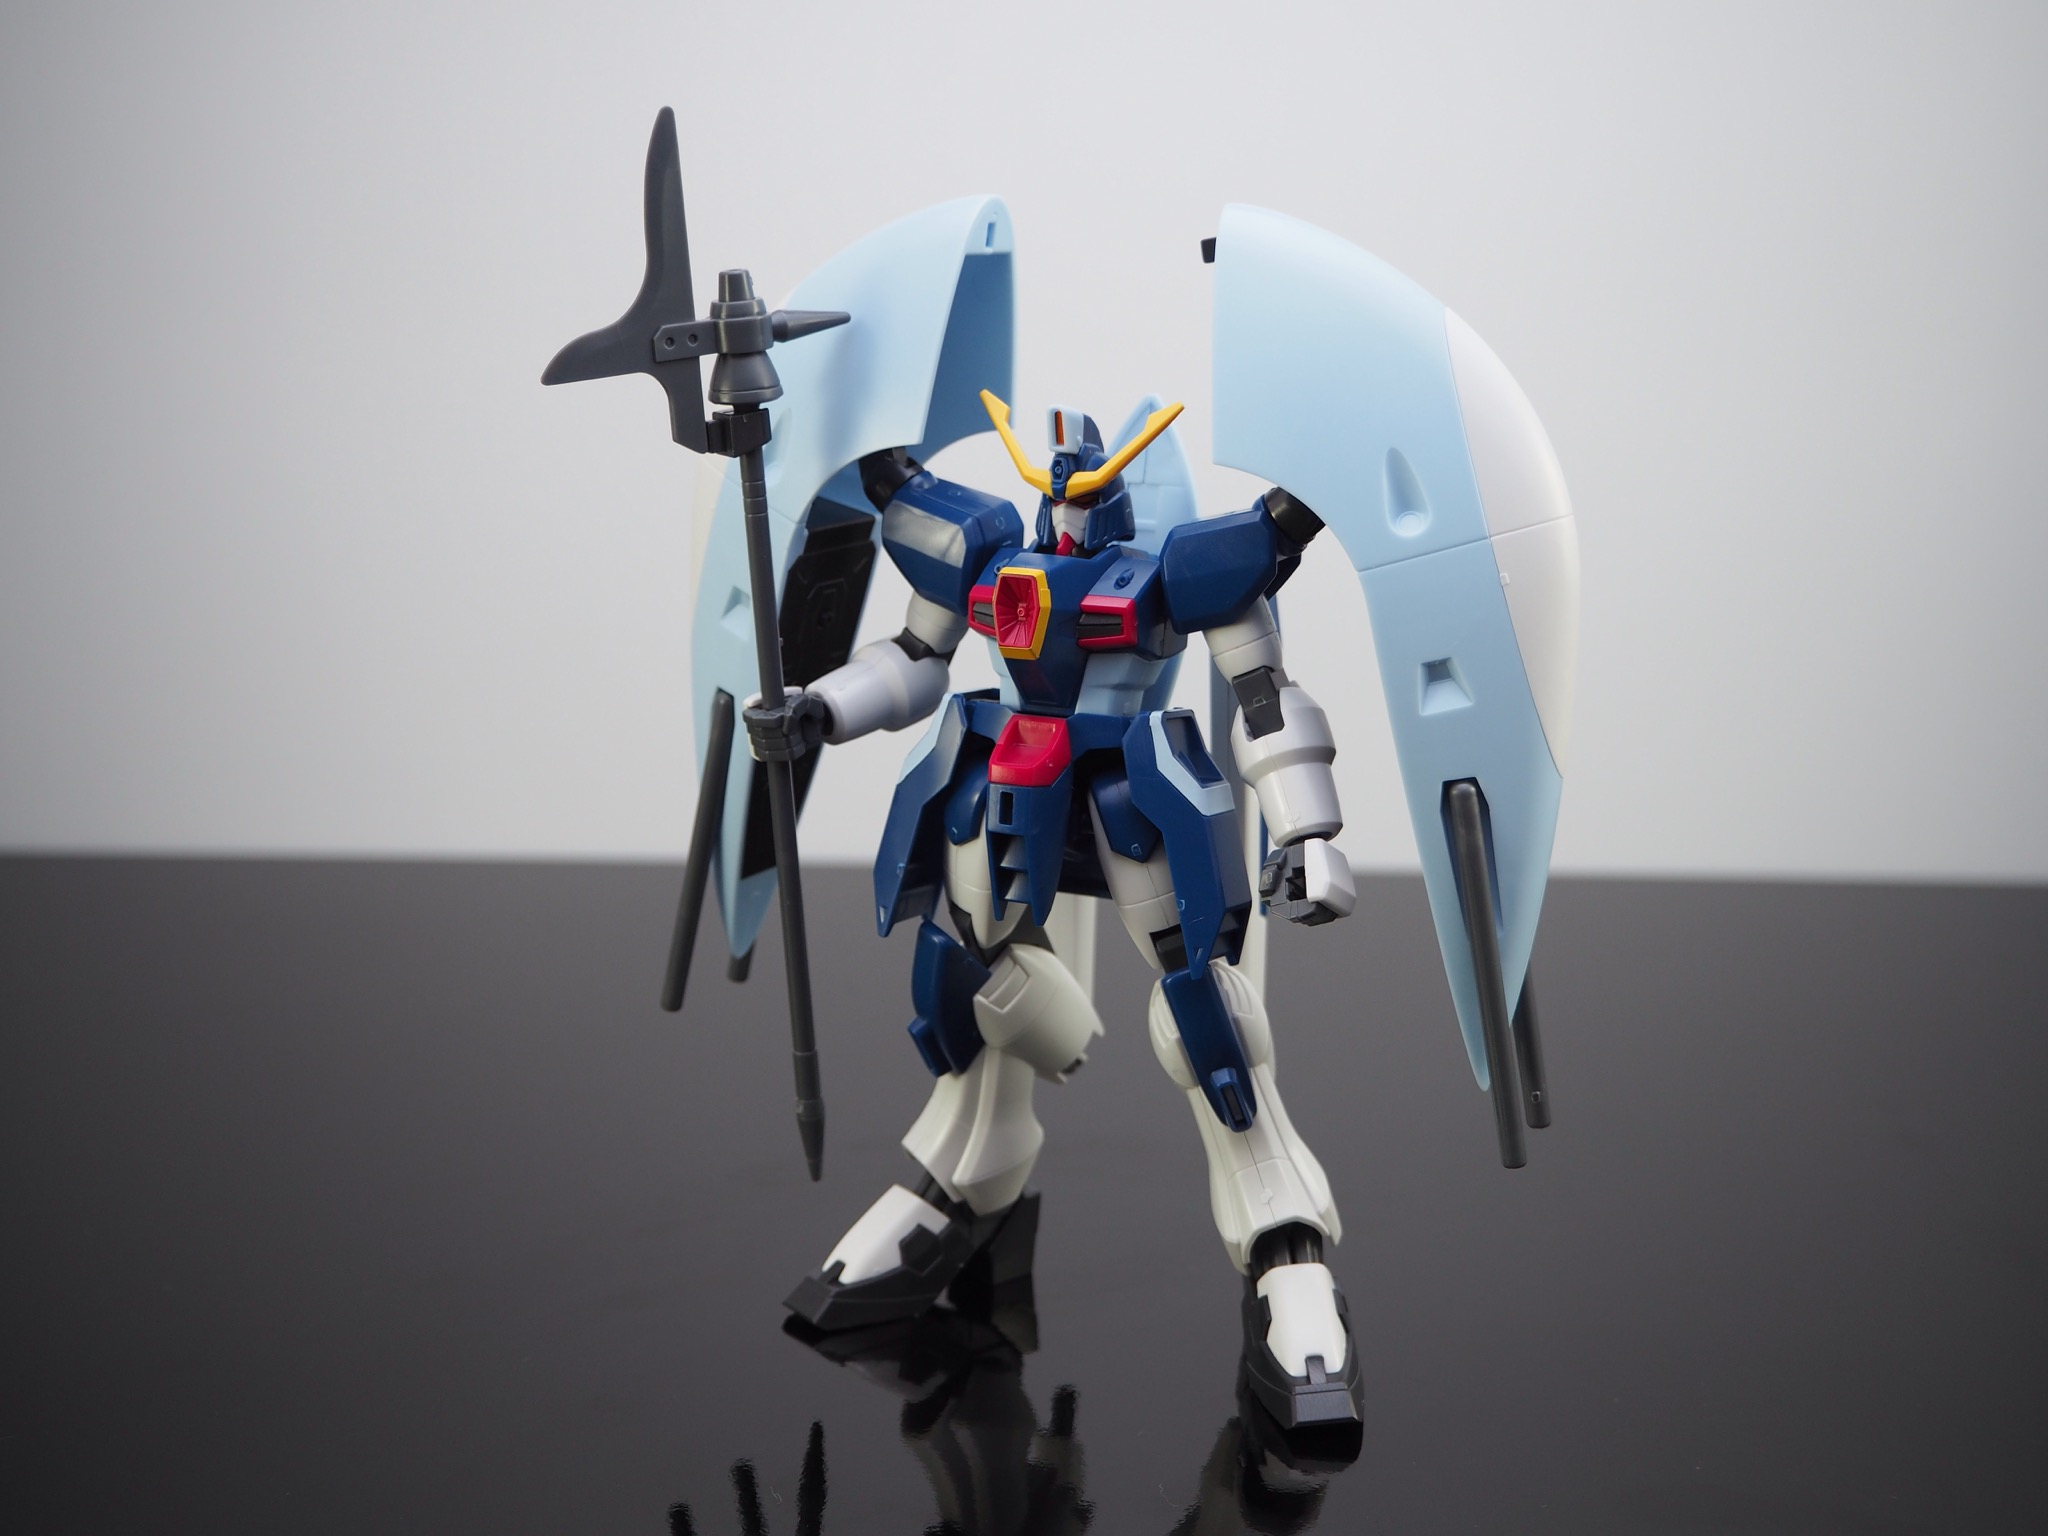 HG 1/144 ZGMF-X31S アビスガンダム [Abyss Gundam]